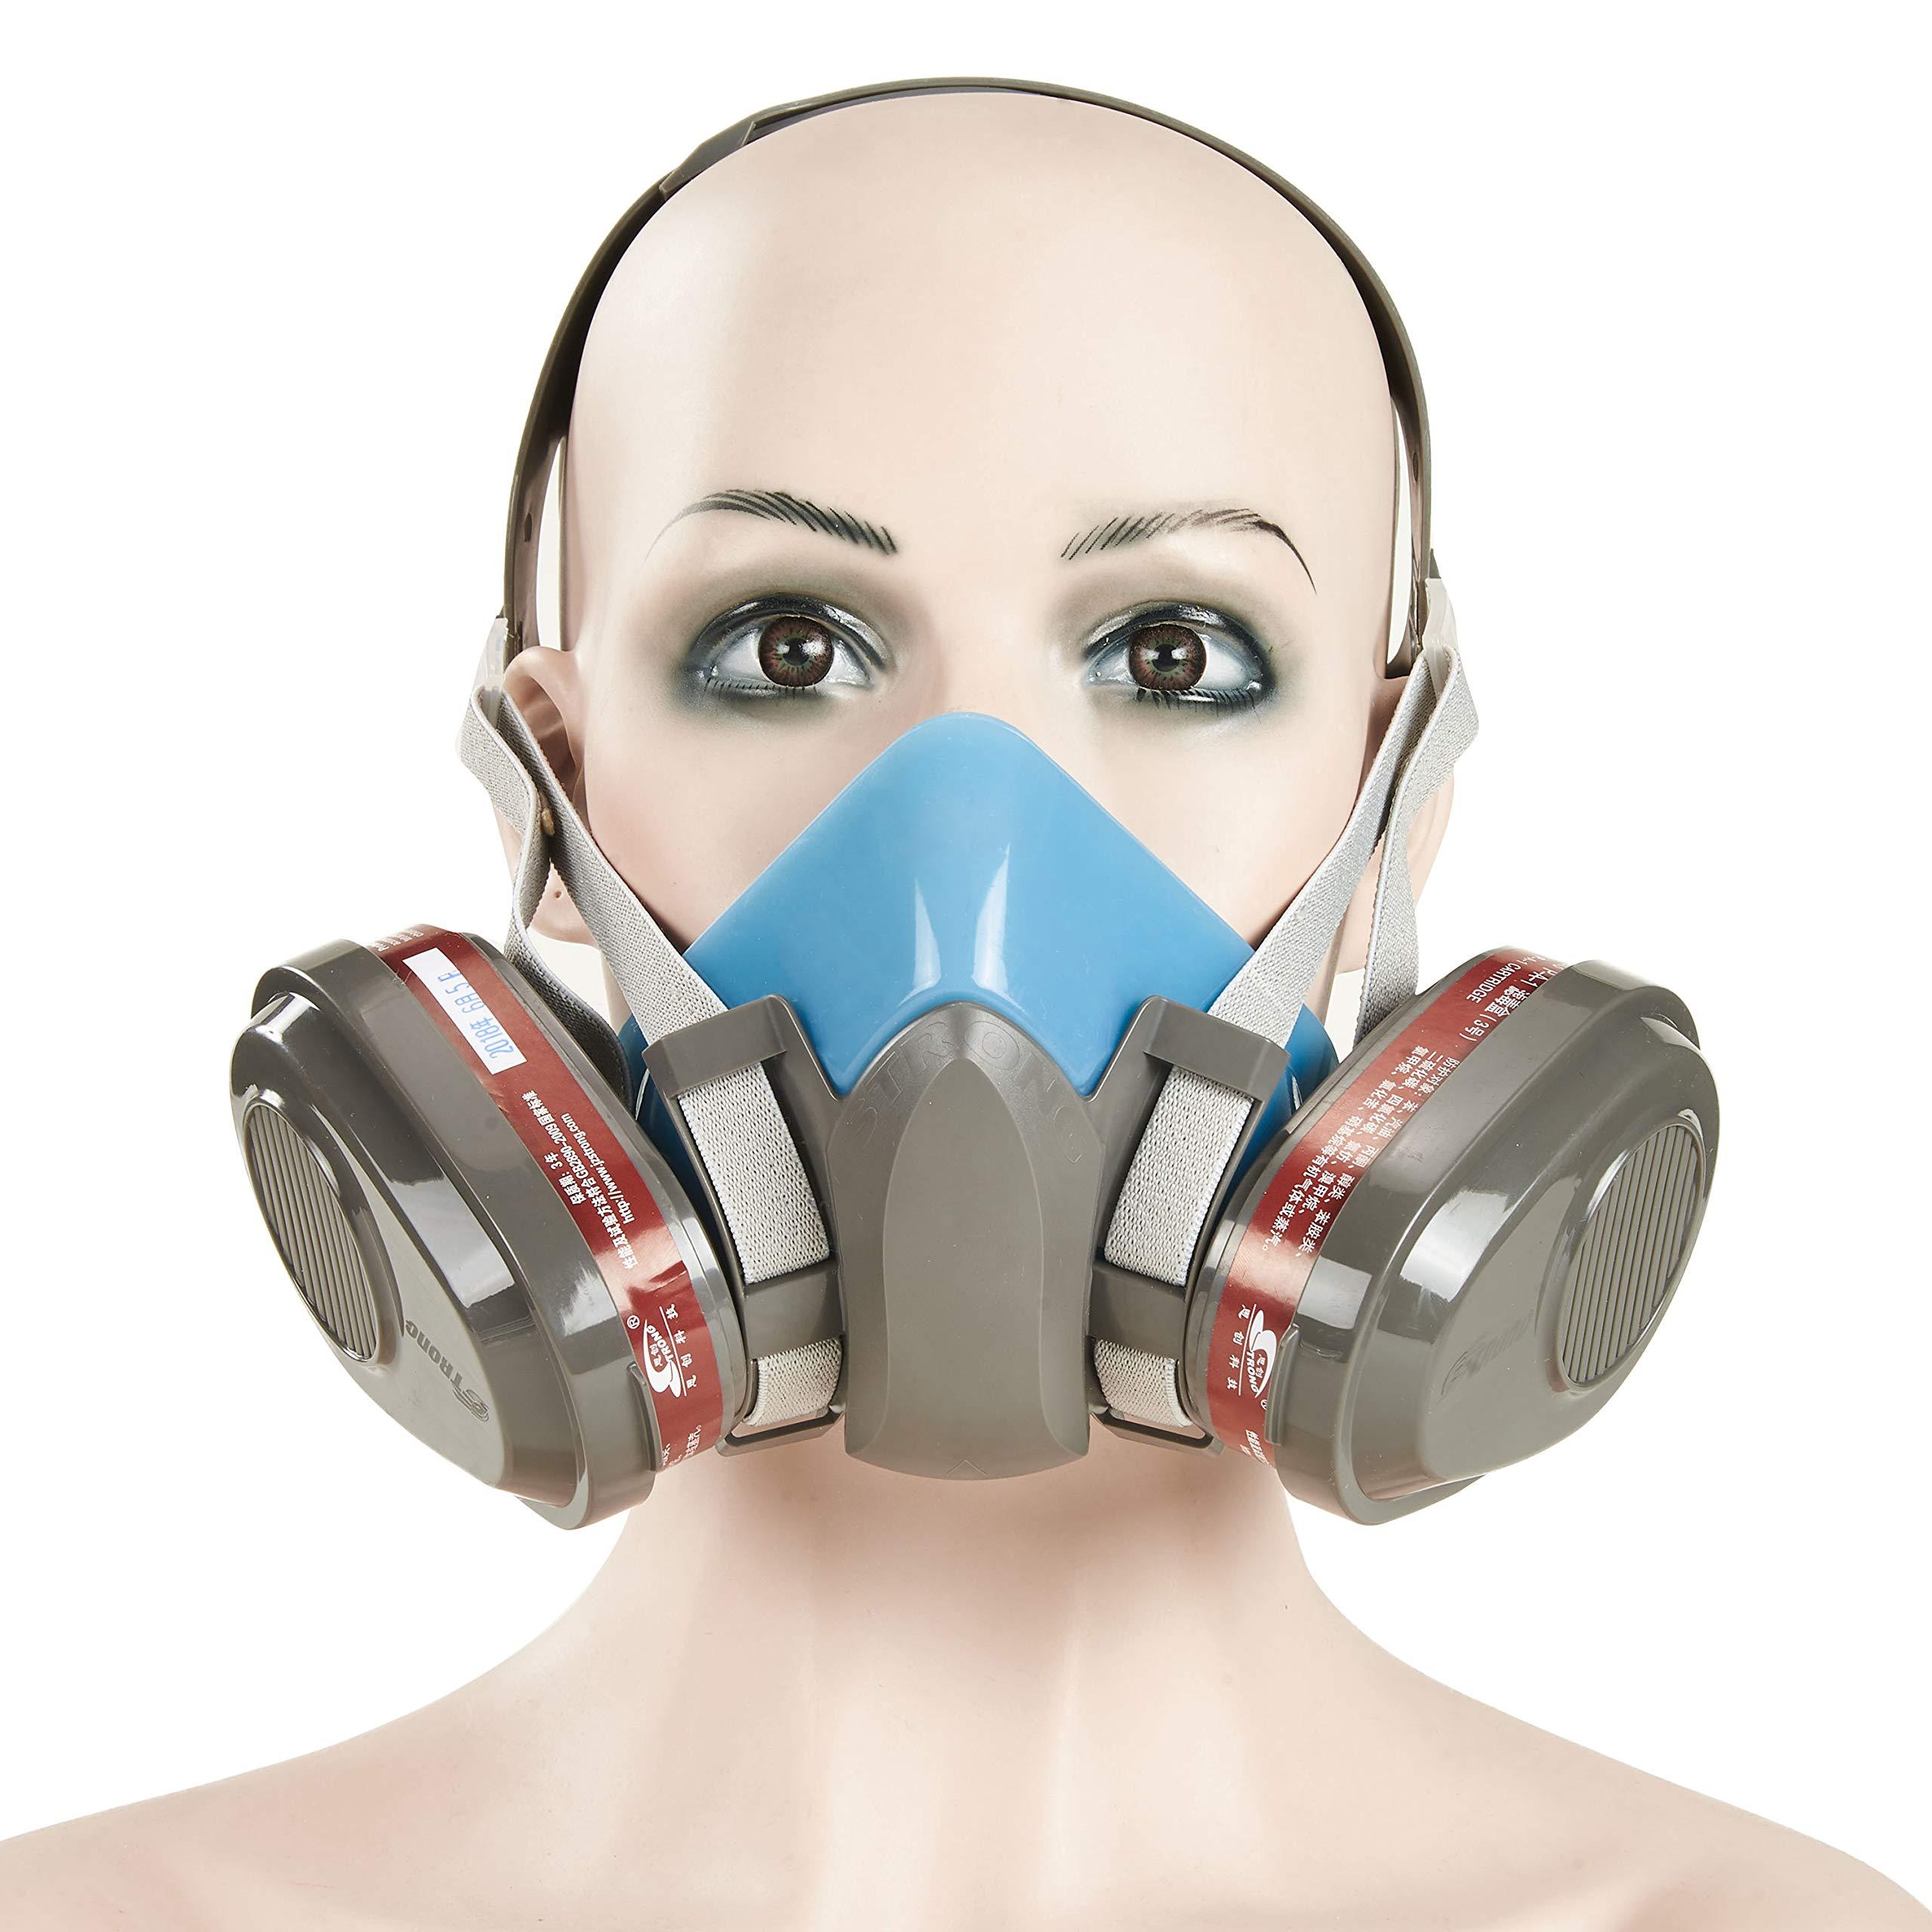 Houlo Half Facepiece Safety Respirator Respiratory Protection with Organic Vapor Cartridge 1 Pair (ST-M40-3B mask+ 1 pair filter cartridge)